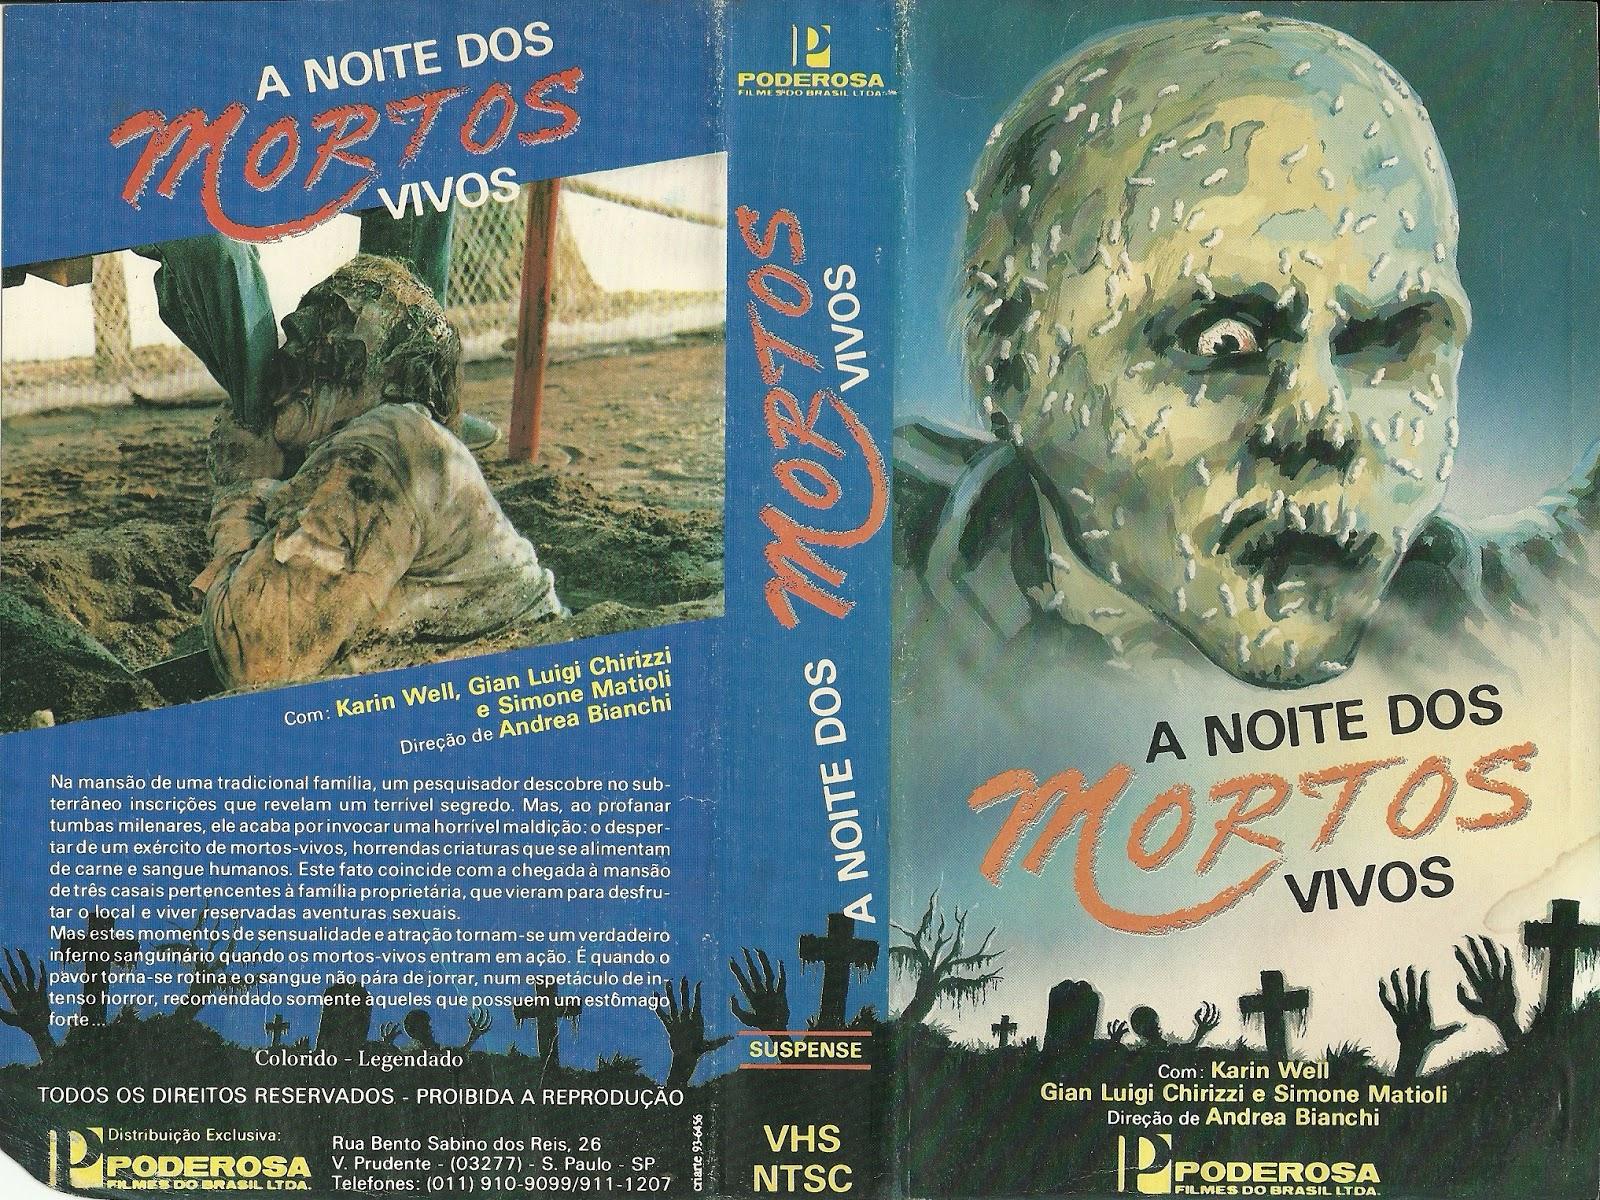 Filme Mortos Vivos with regard to vhs - o Último reduto: a noite dos mortos-vivos / a noite do terror